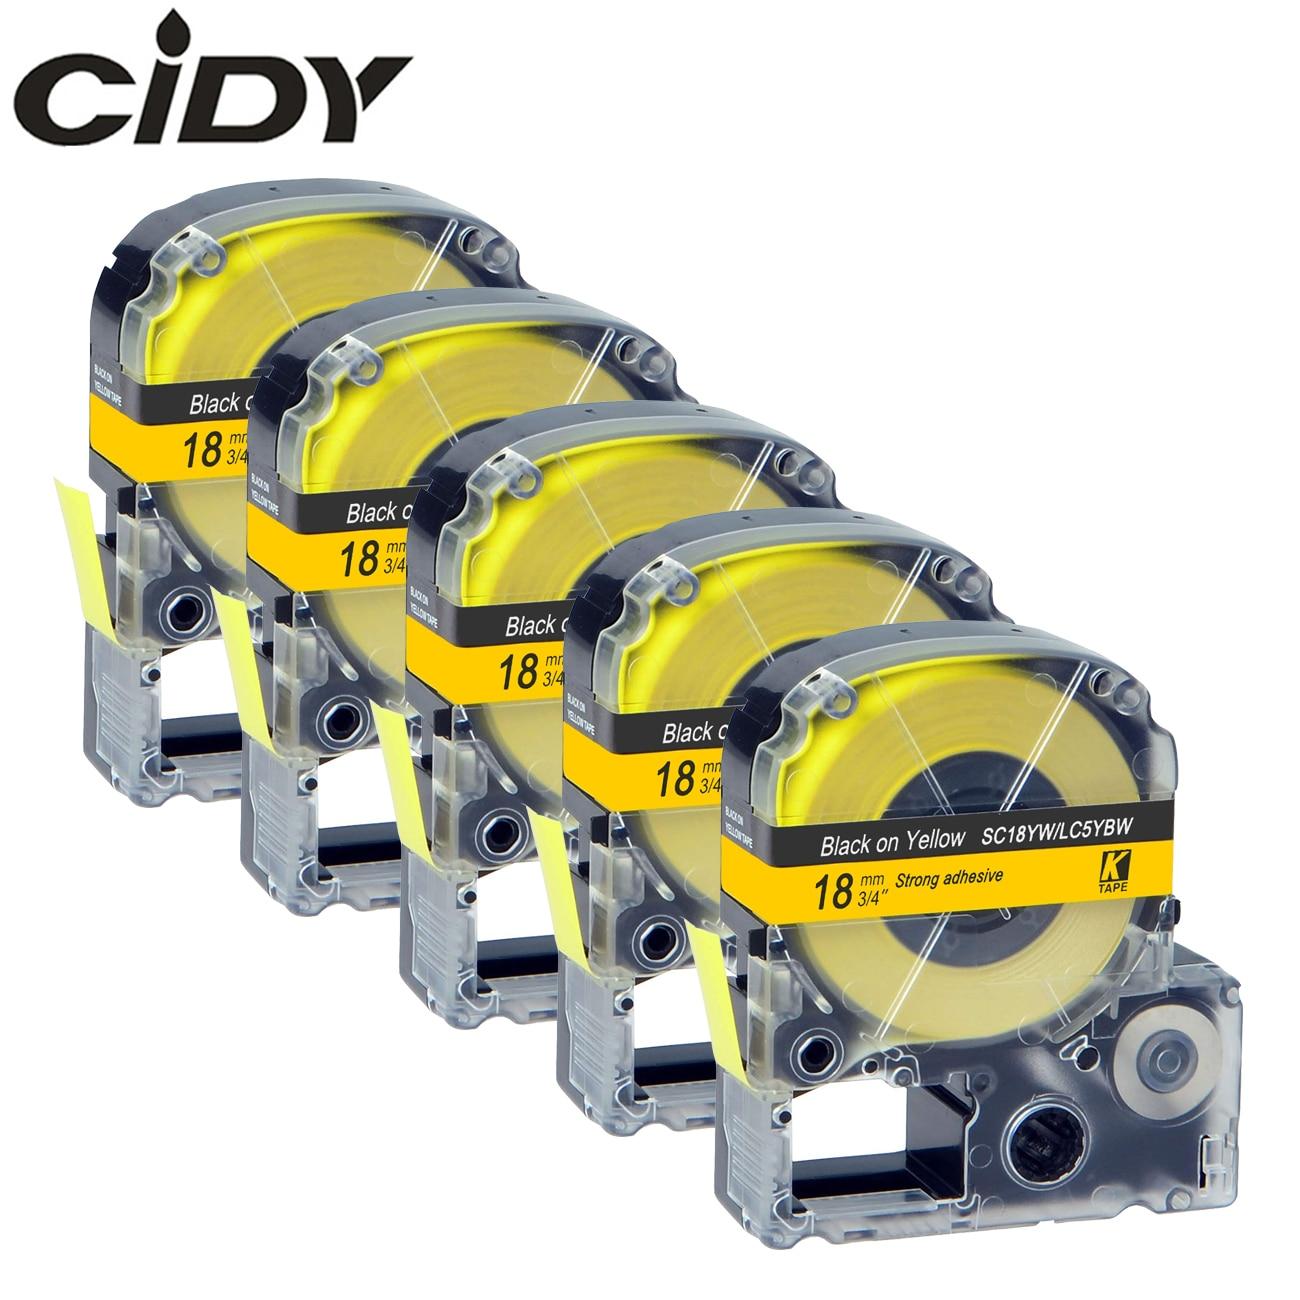 CIDY 5 шт. SC18YW/LC5YBW LC-5YBW9 совместимая с kingjim 18 мм черная на желтой этикетке лента для Epson машины LW300 LW400 LW-600P